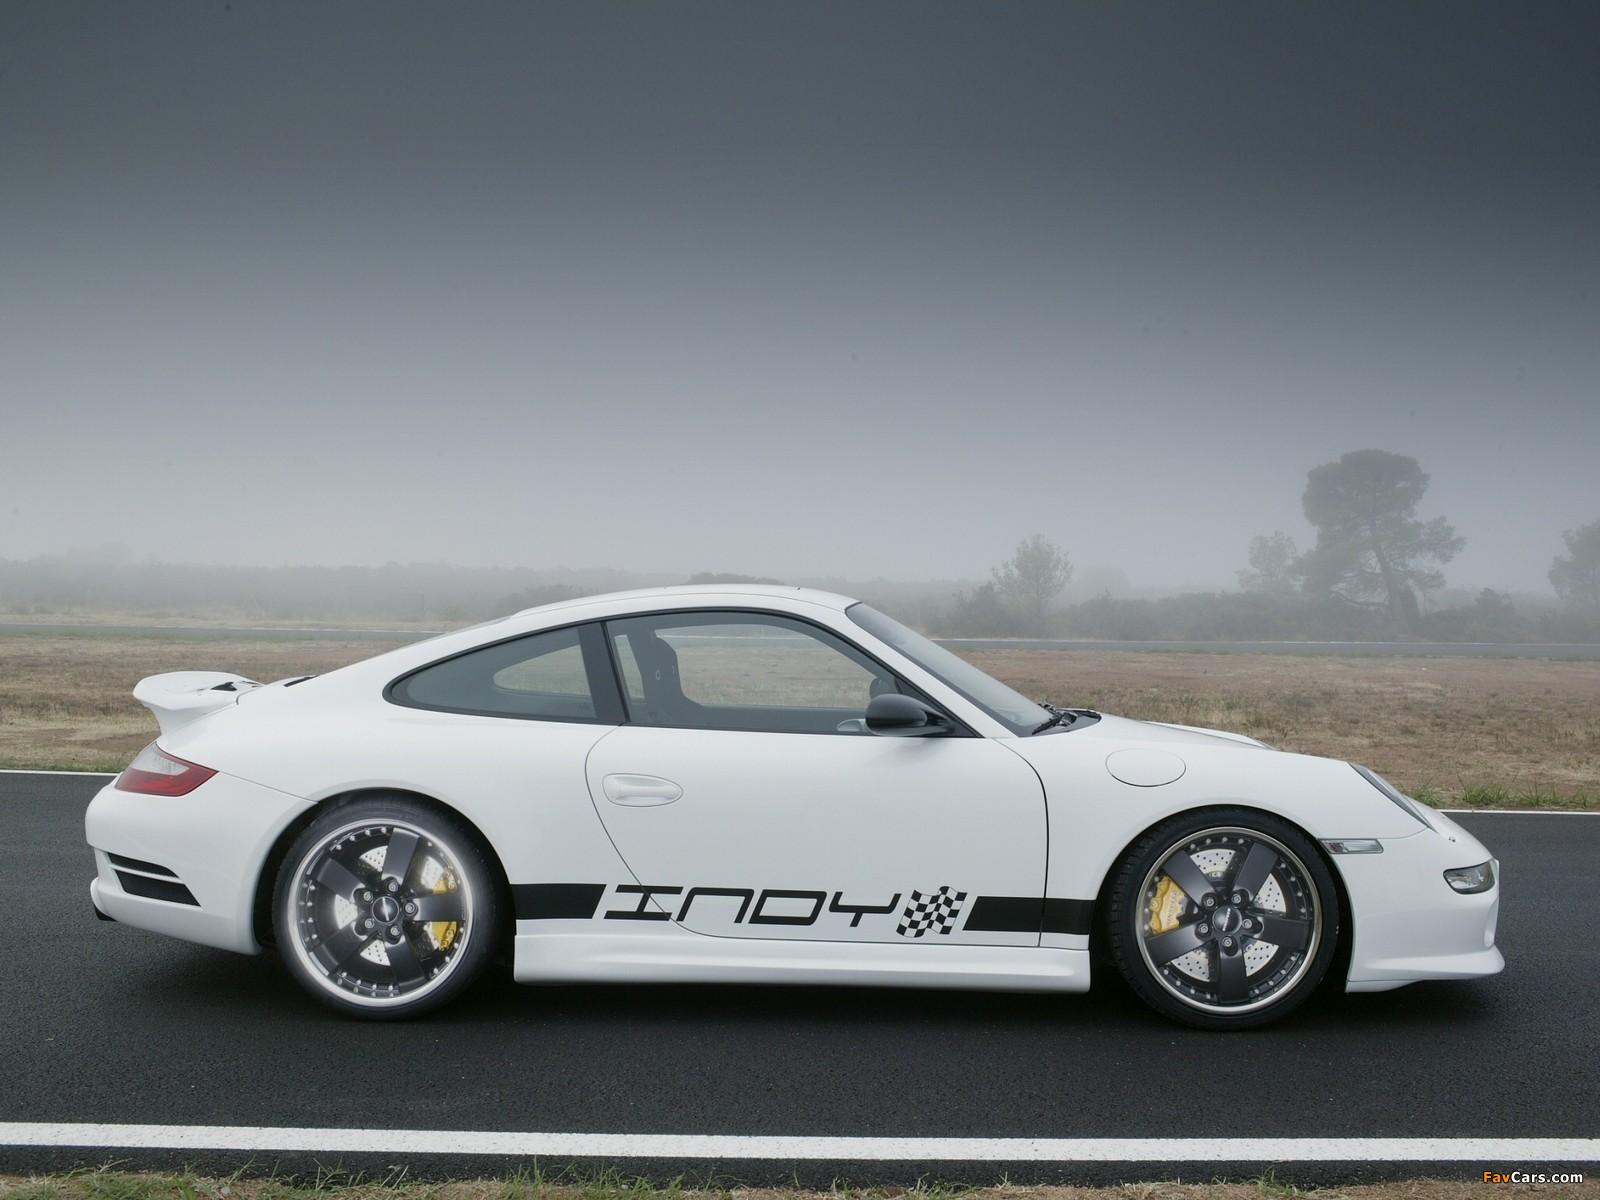 Rinspeed Porsche Indy (997) 2005 images (1600 x 1200)